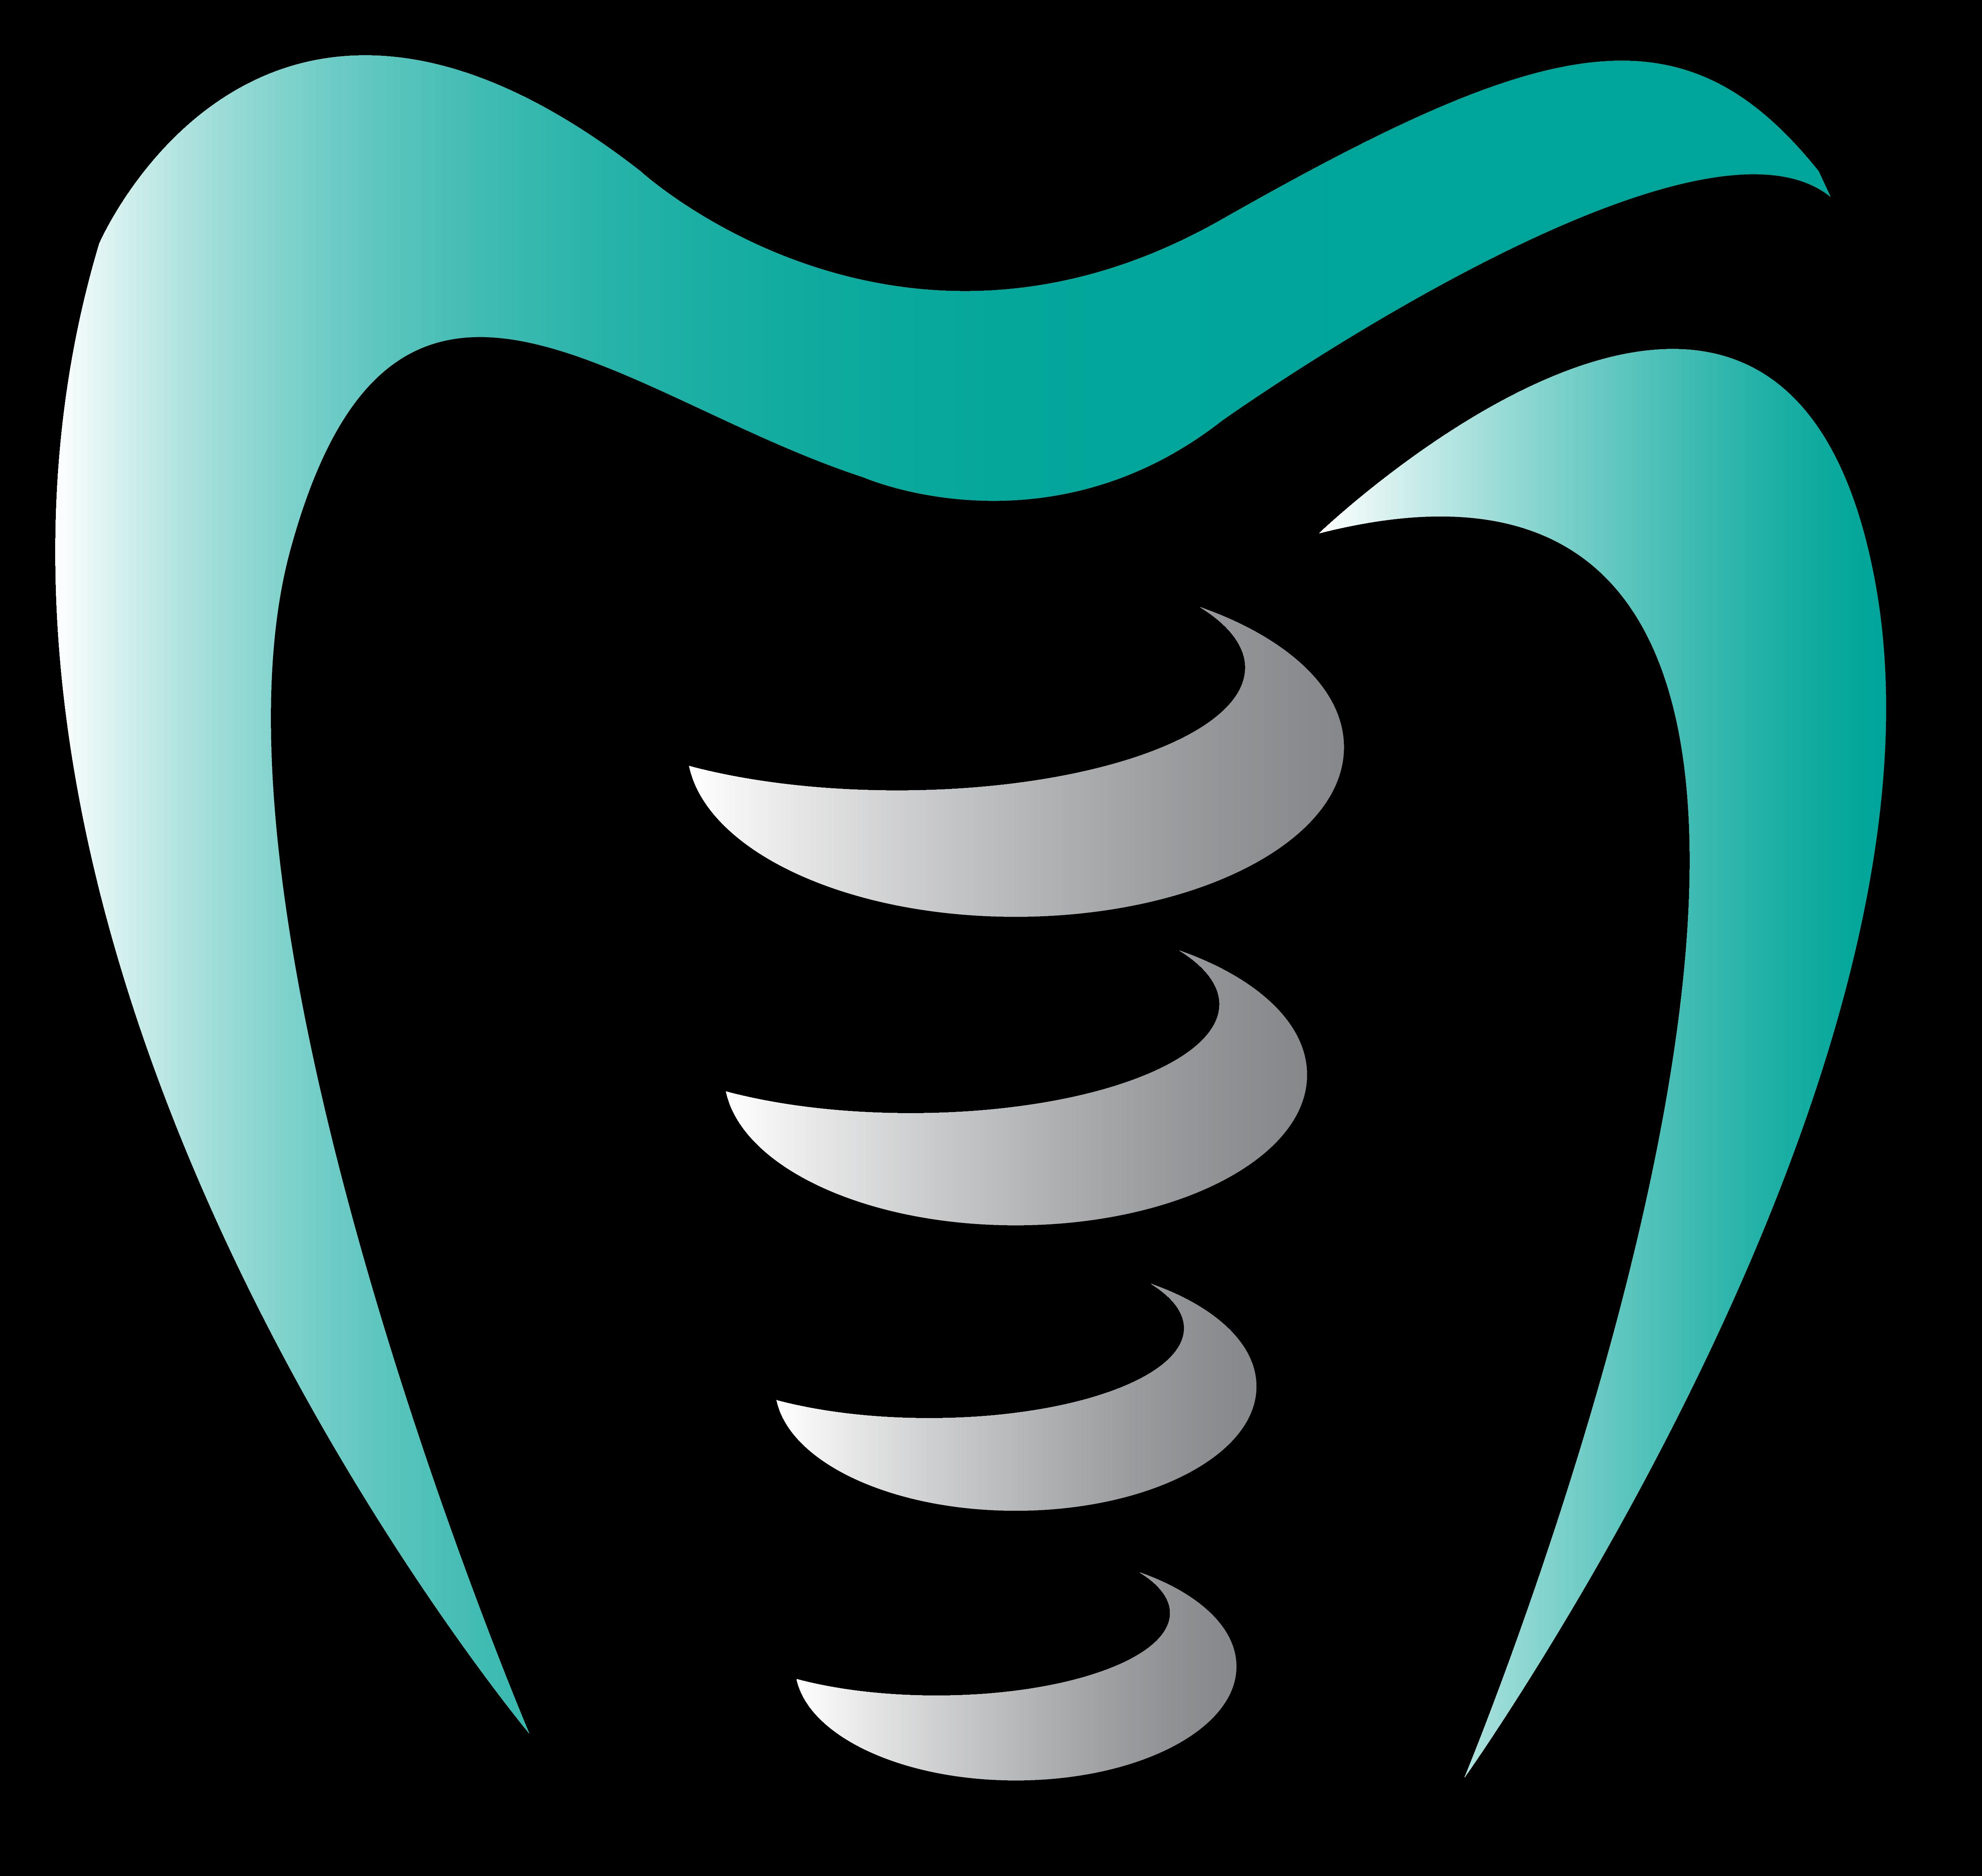 Dentist clipart symbol. In clifton nj implant